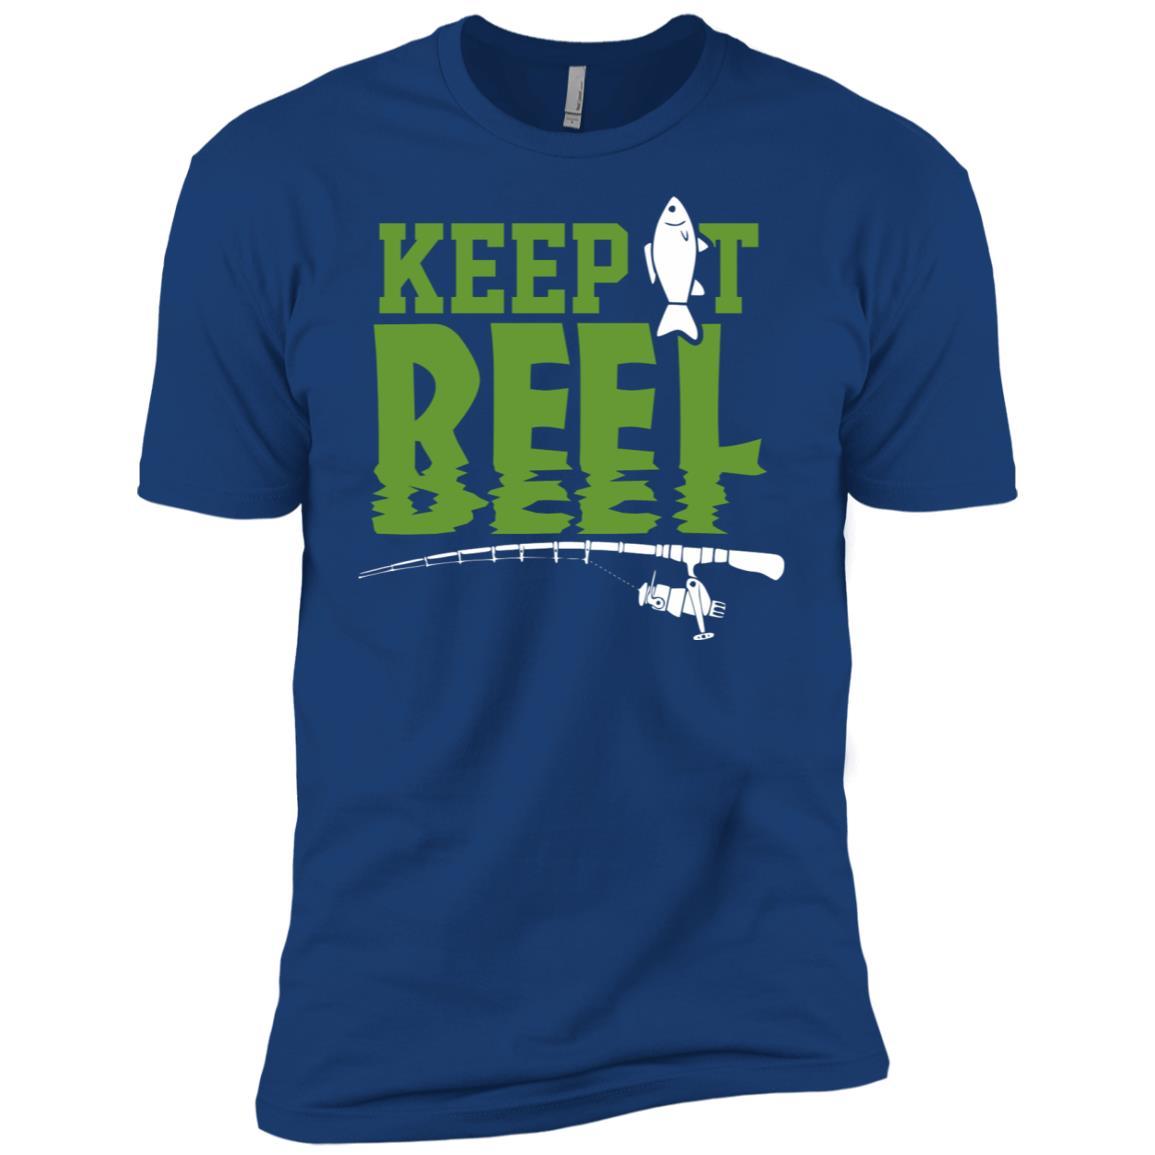 Keep it Reel Funny Outdoors Fisherman Fishing Men Short Sleeve T-Shirt